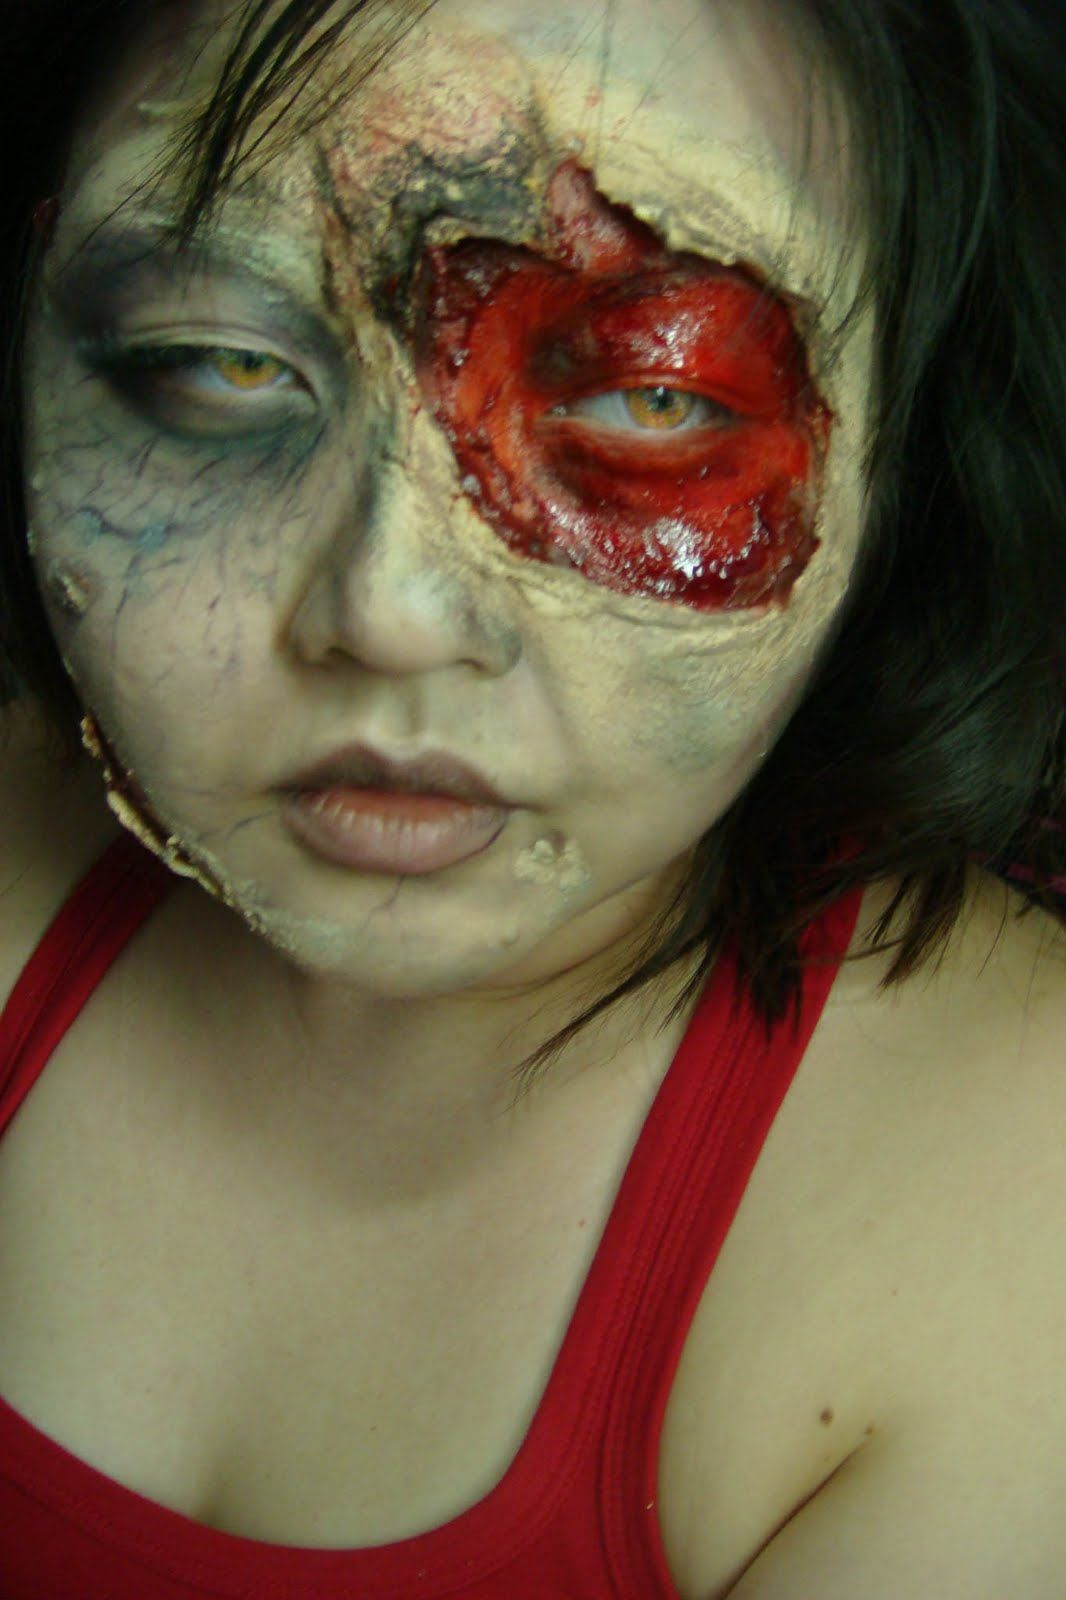 17 best images about Halloween on Pinterest | Halloween makeup ...